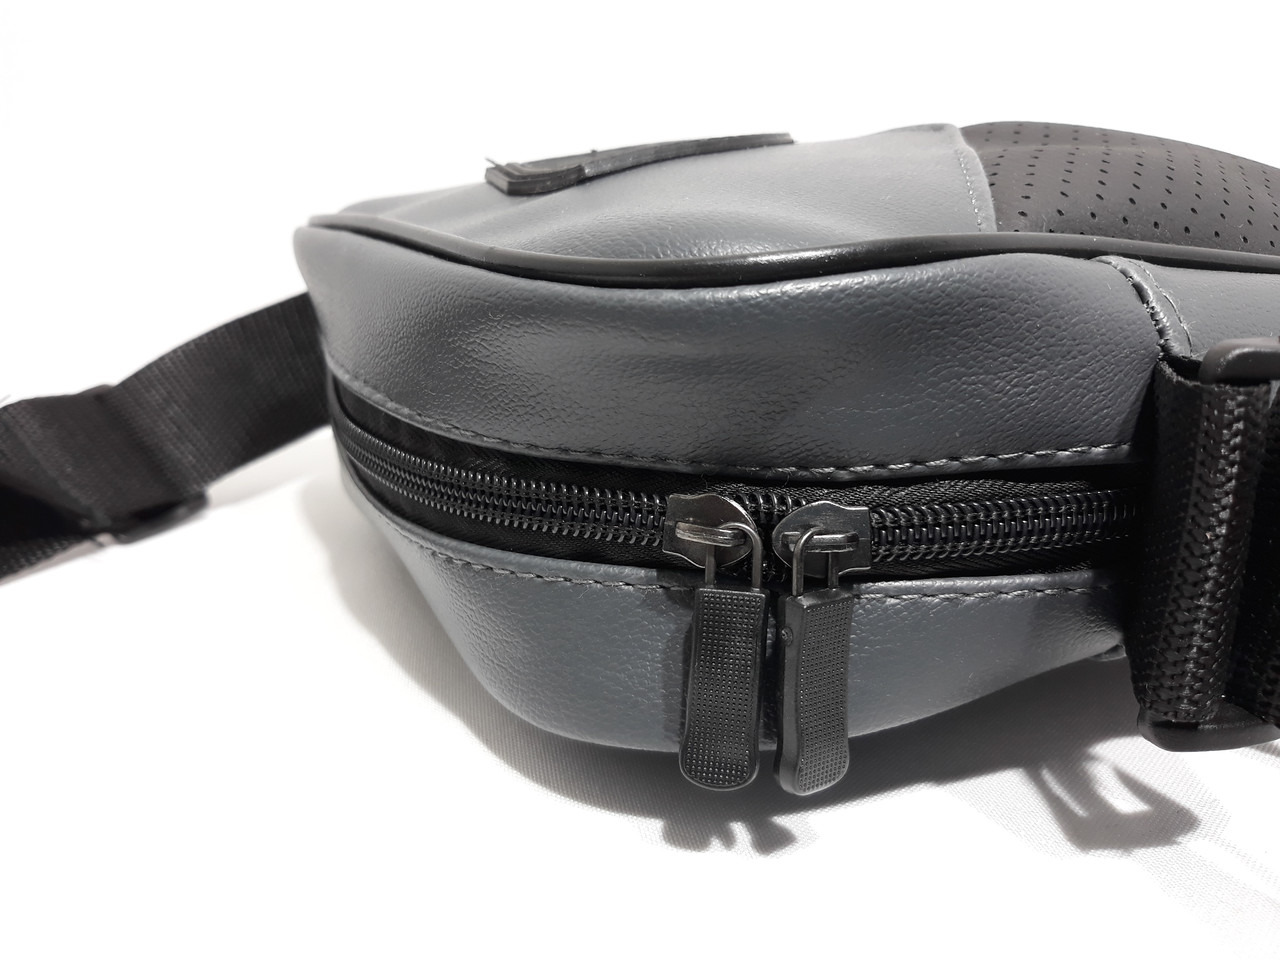 57d7d0554869 Мужская сумка Puma ferrari на каждый день реплика люкс качества 2х  компонентная кожа PU, цена 243 грн., купить в Умани — Prom.ua (ID#779050664)